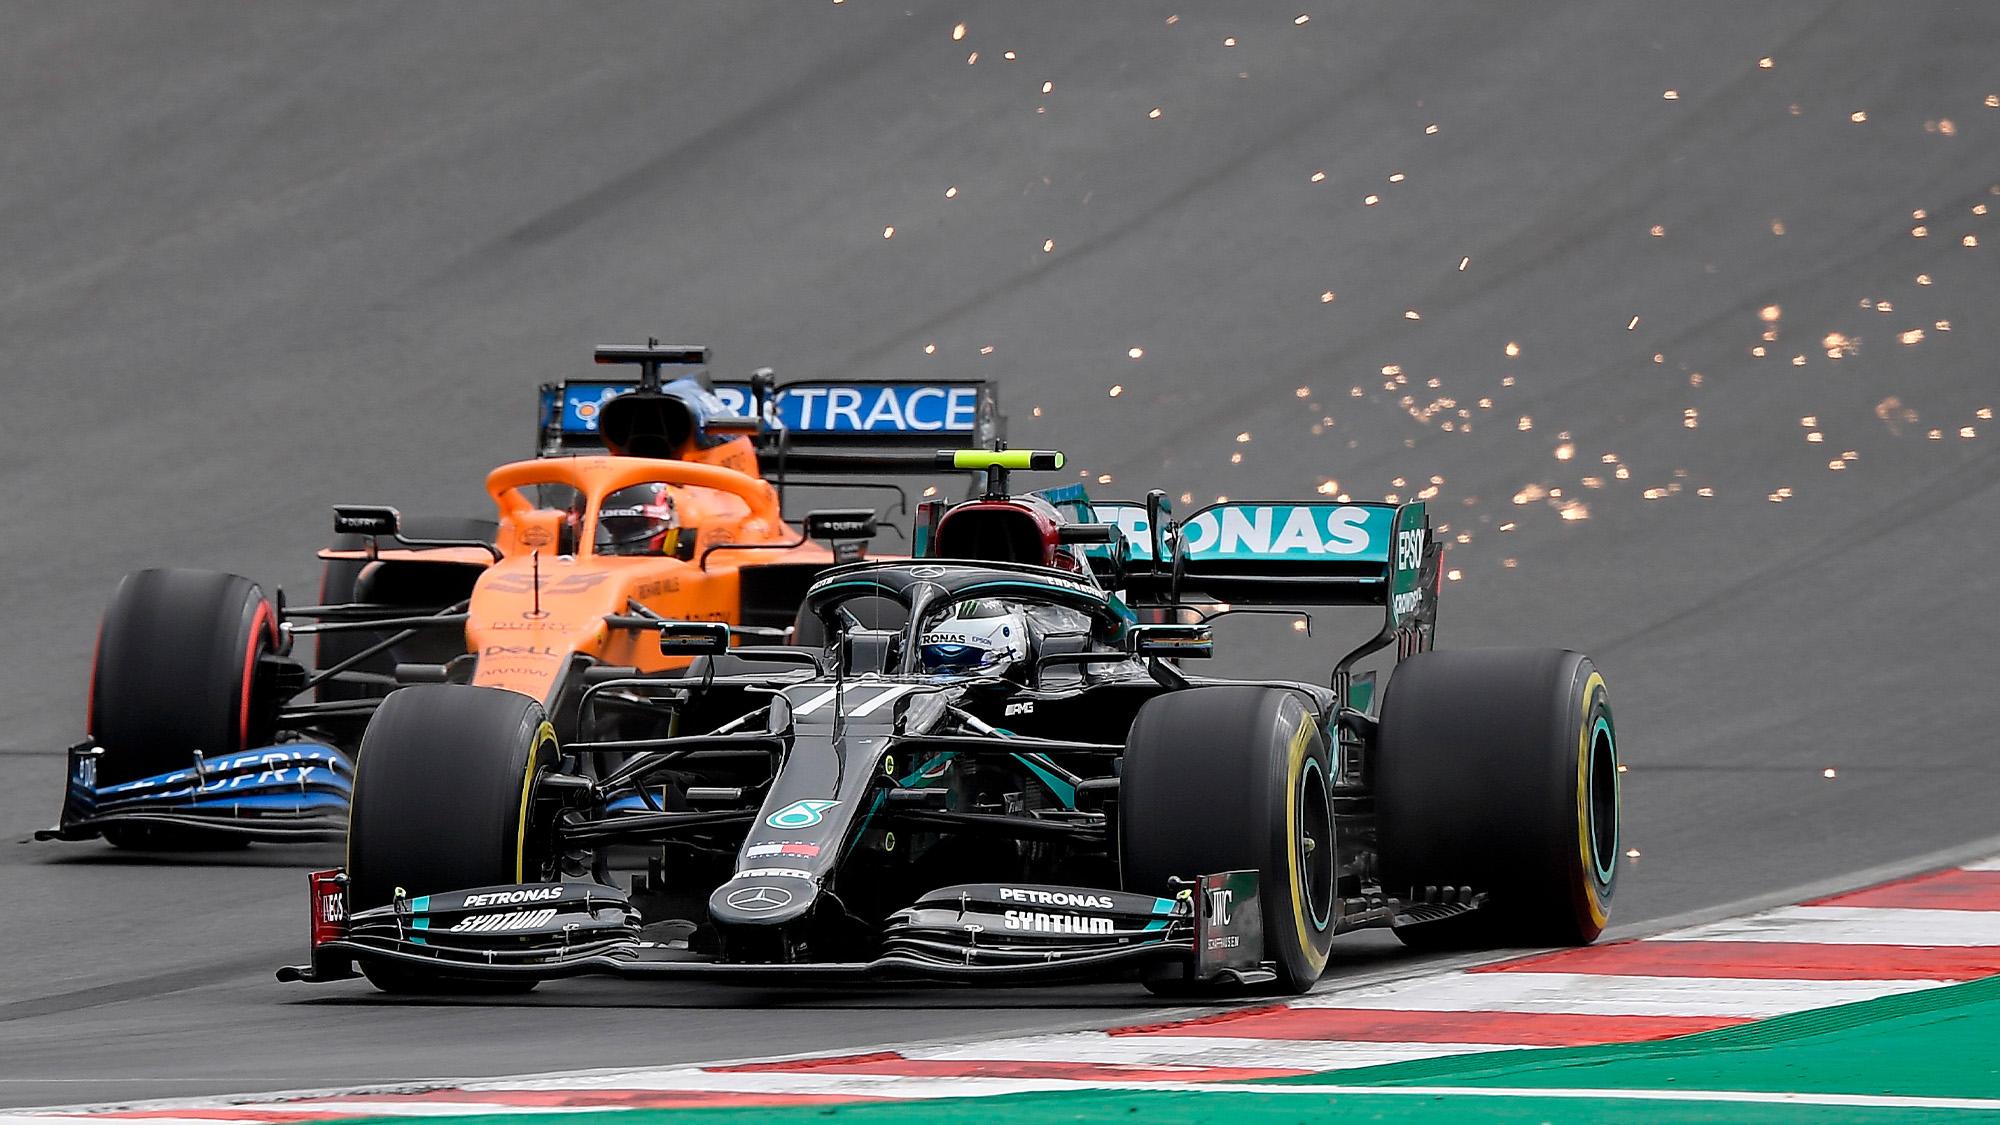 Valtteri Bottas passes Lando Norris for the lead of the 2020 Portuguese Grand Prix at Portimao